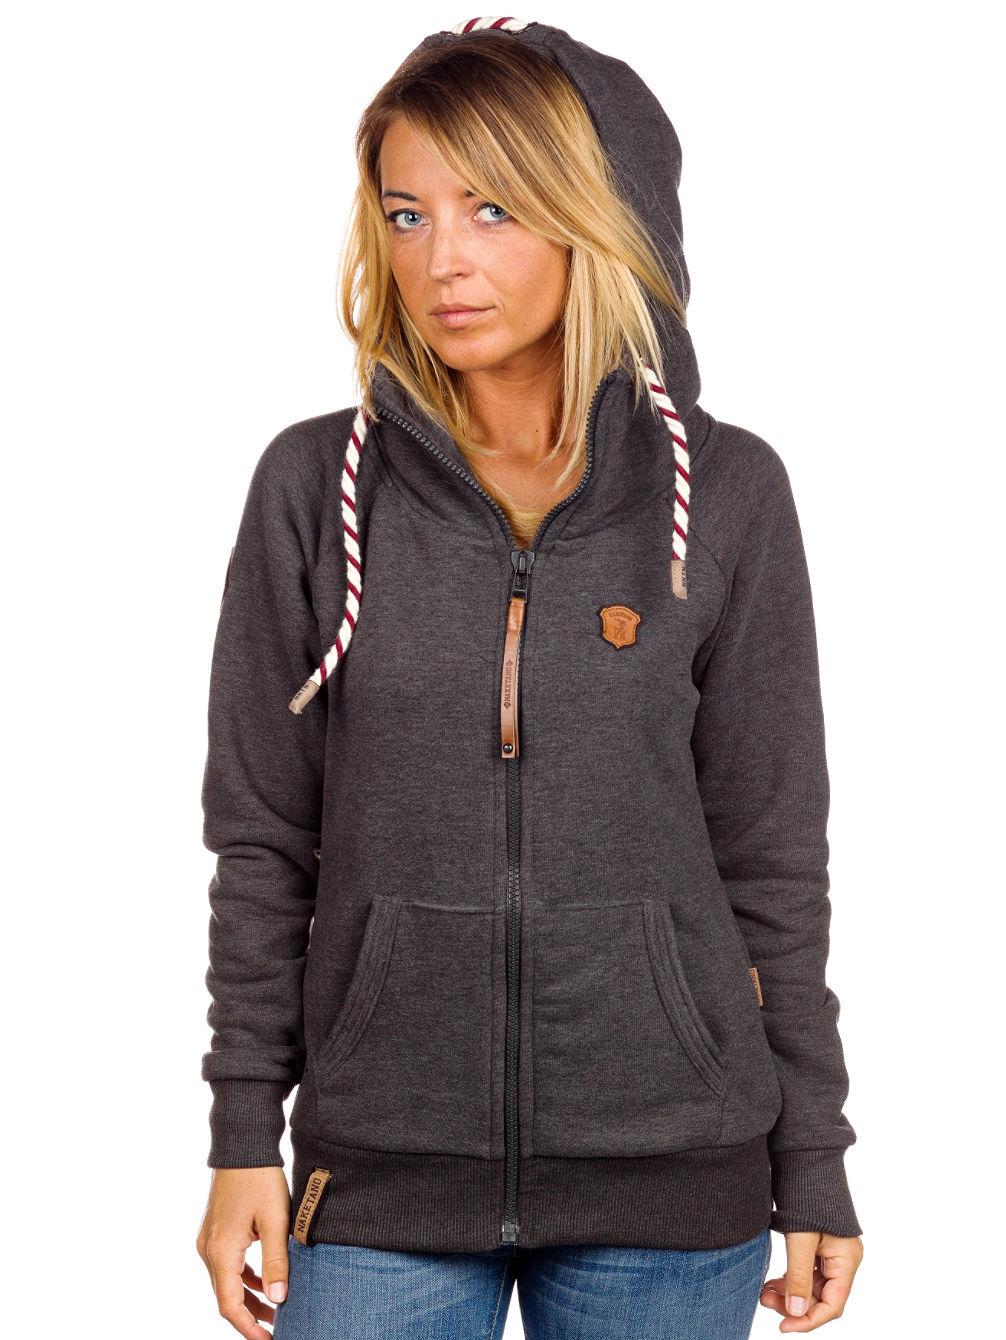 naketano side zip hoodie women 39 s gray cardigan sweater. Black Bedroom Furniture Sets. Home Design Ideas